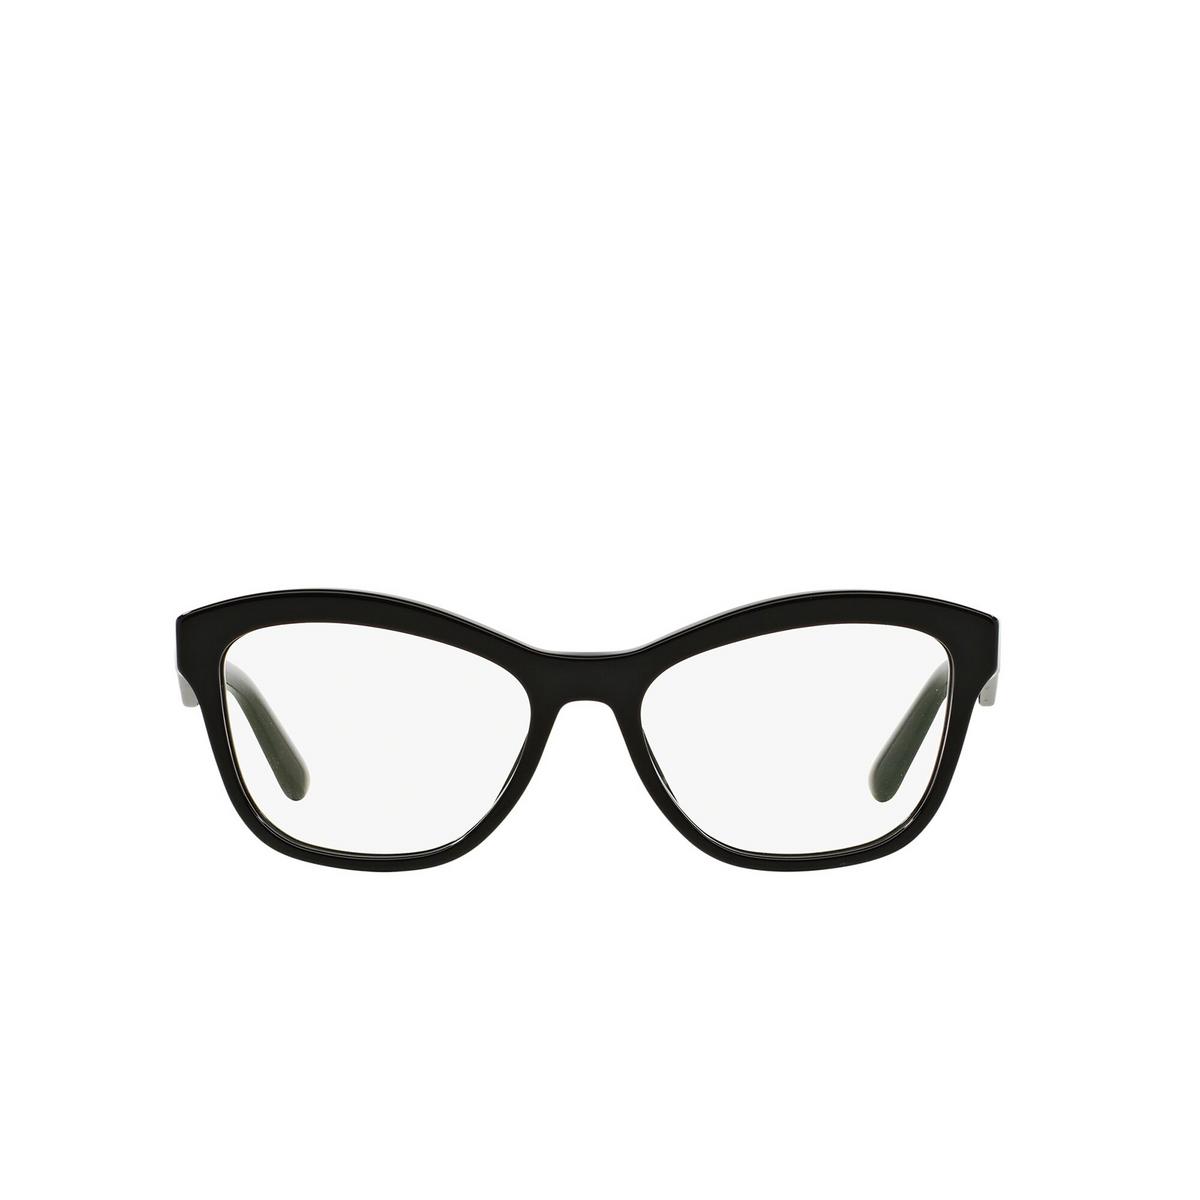 Prada® Cat-eye Eyeglasses: Heritage PR 29RV color Black 1AB1O1 - front view.